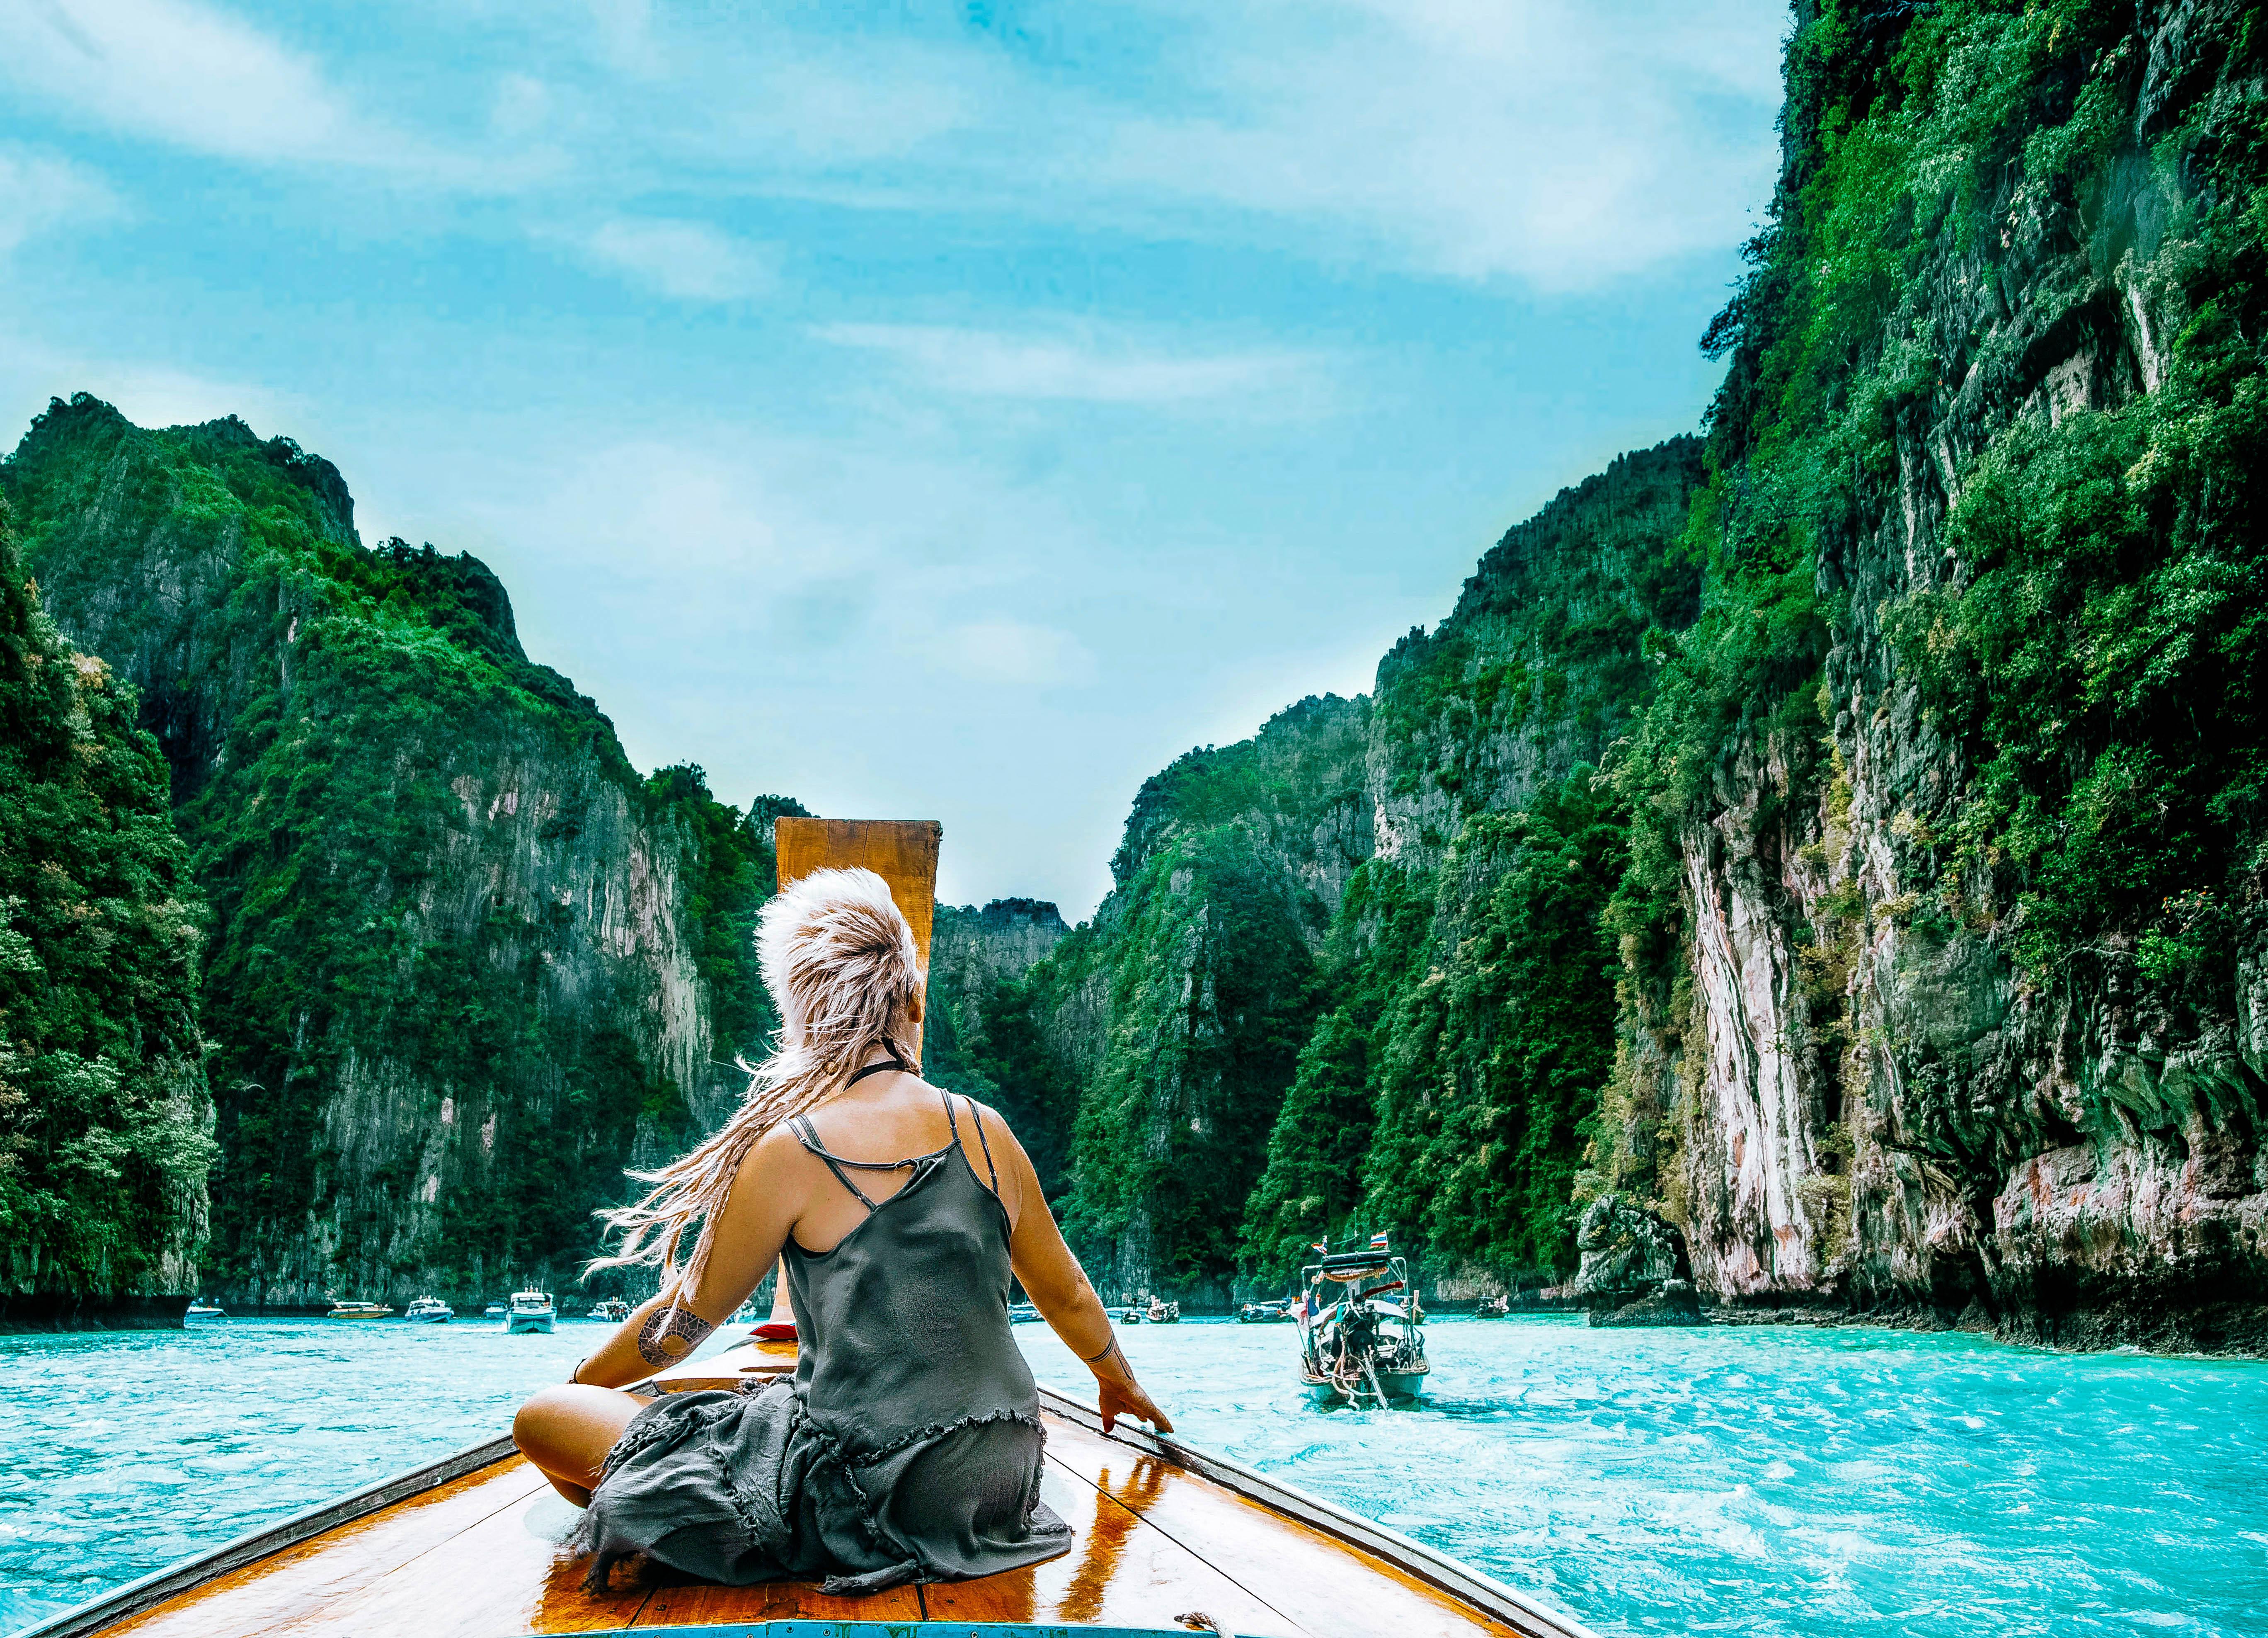 phi phi islands boat trip maya beach thailand south east asia water blue palms island hopping